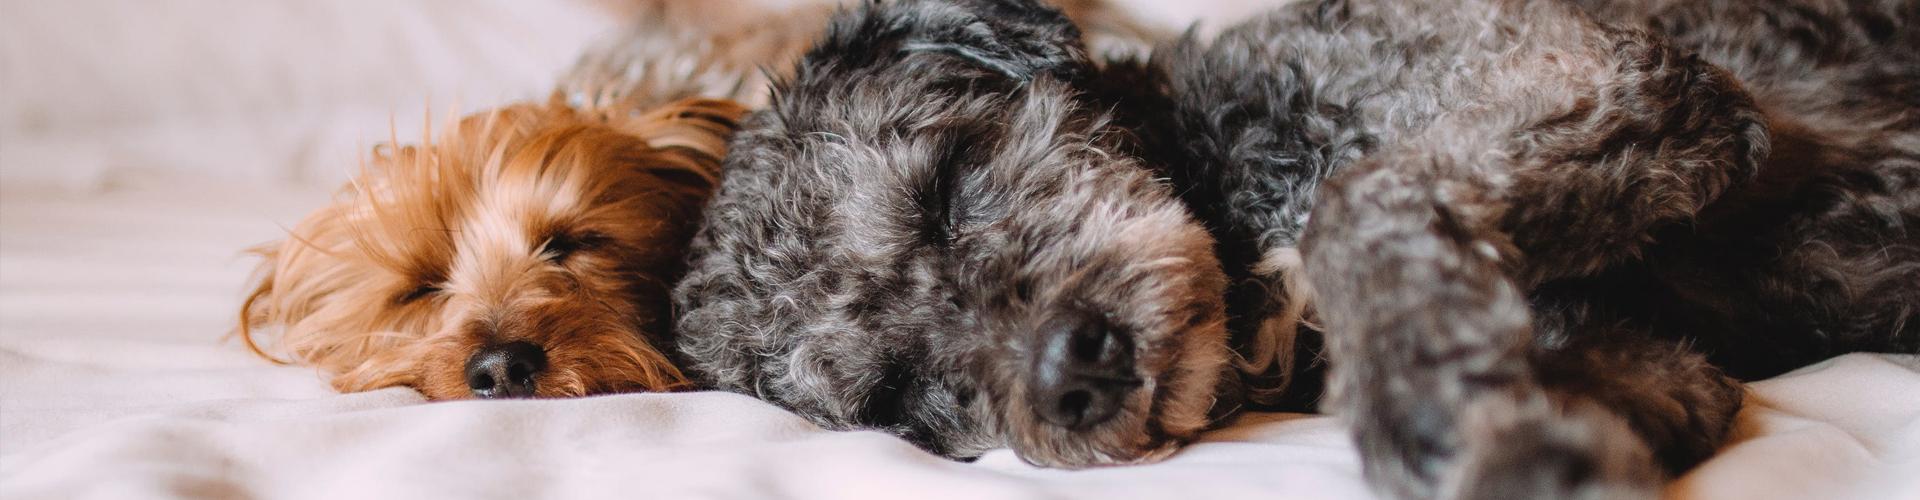 Pet friendly holiday accommodation Cotswolds